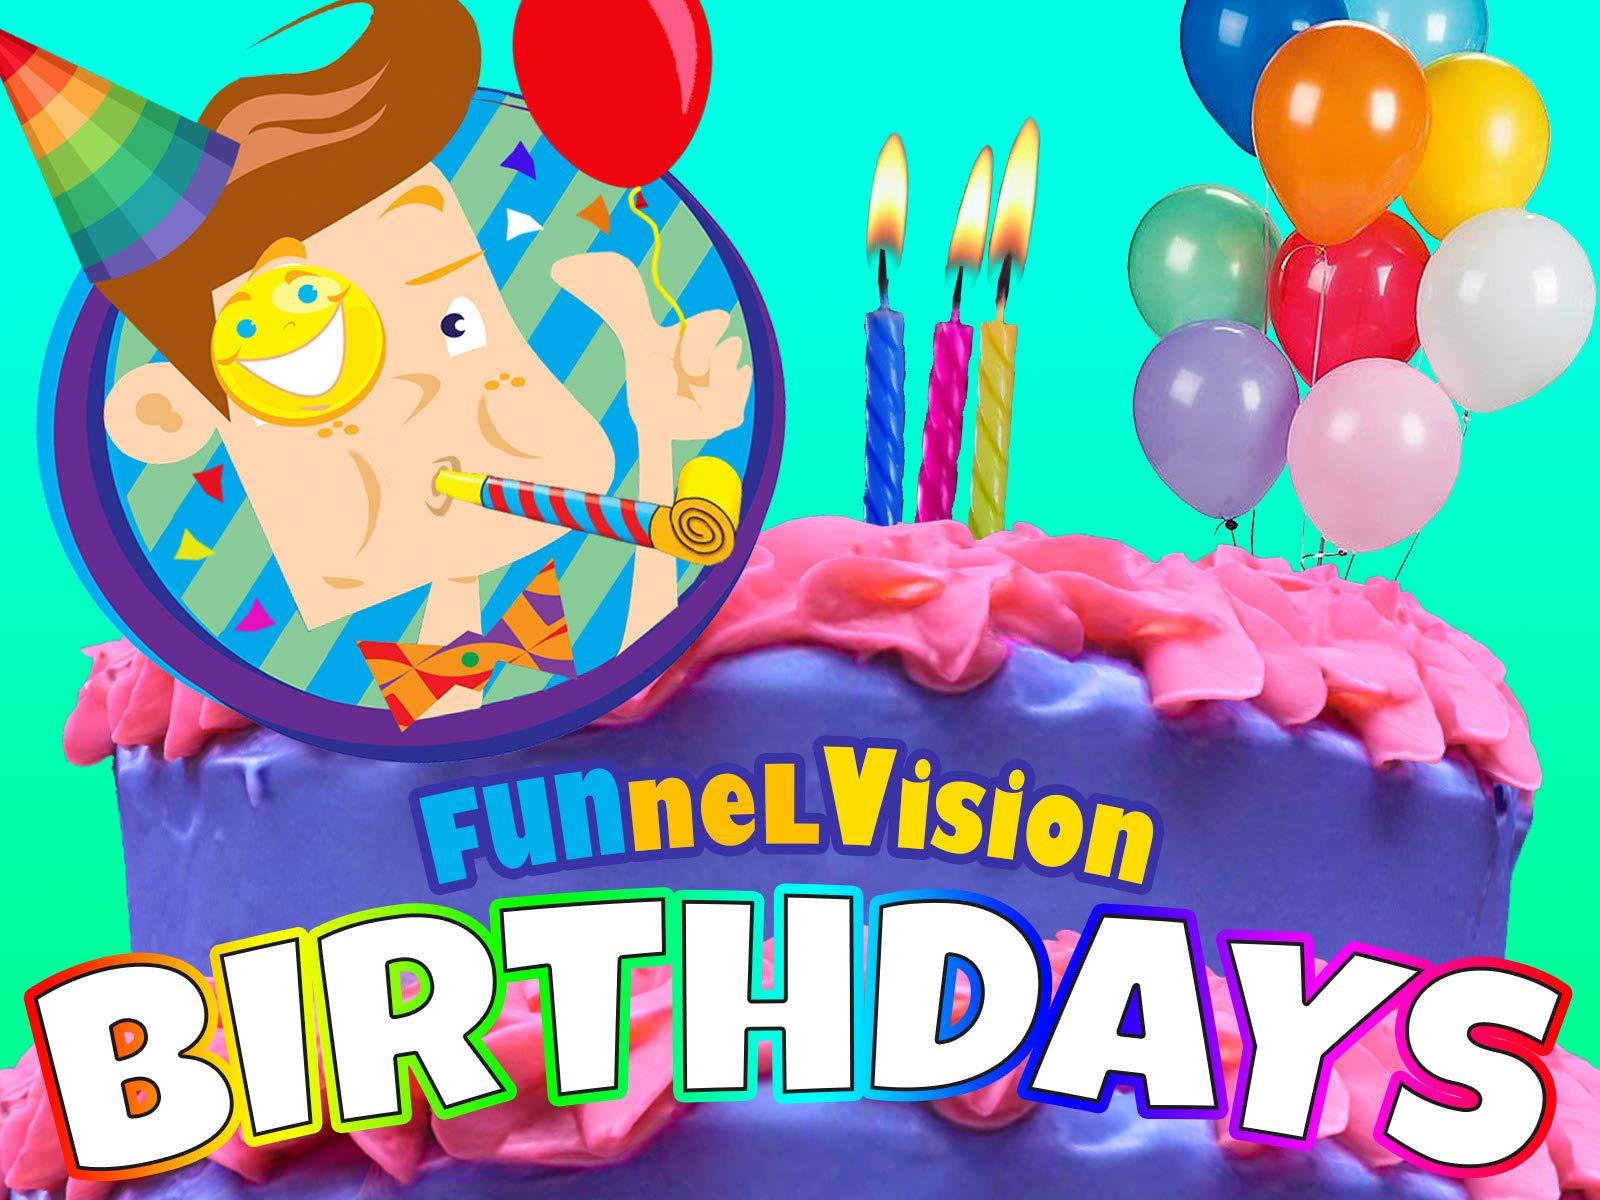 FUNnel Vision: Birthdays on Amazon Prime Video UK